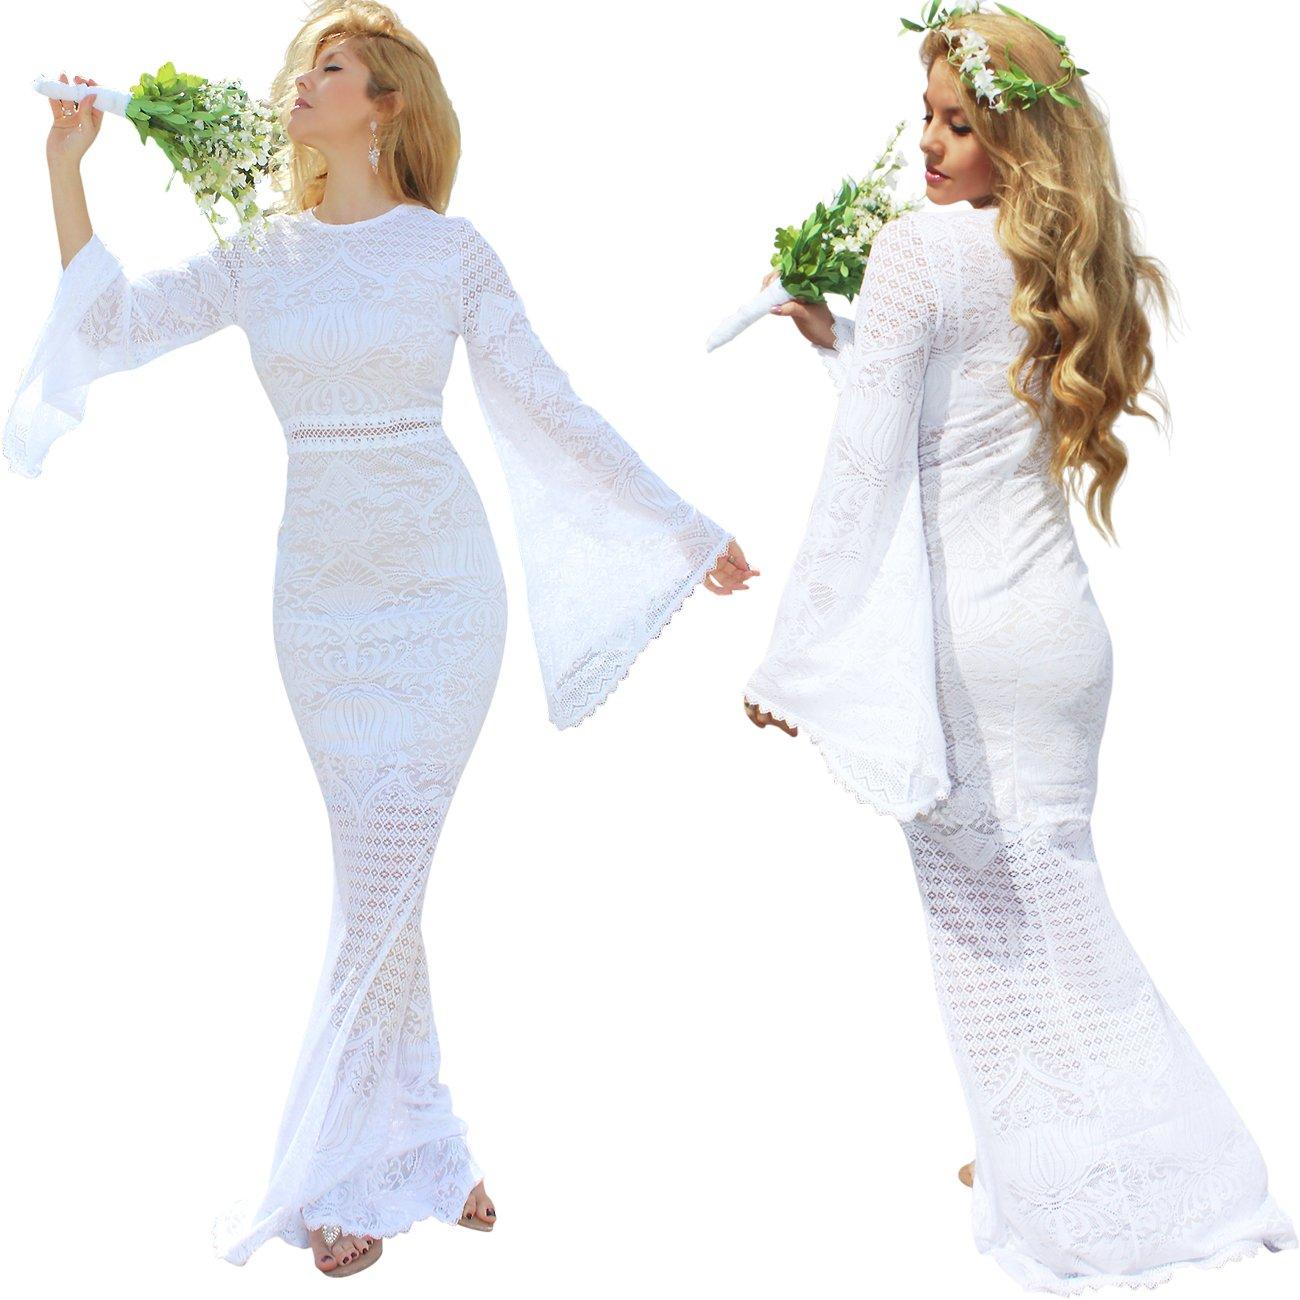 0a420b151f18 Boho Gypsy Wedding Dress| Vintage Angel Bell Sleeve Goddess Bridal Dress |  USA Made Casual Beach Wedding Dress at Amazon Women's Clothing store: